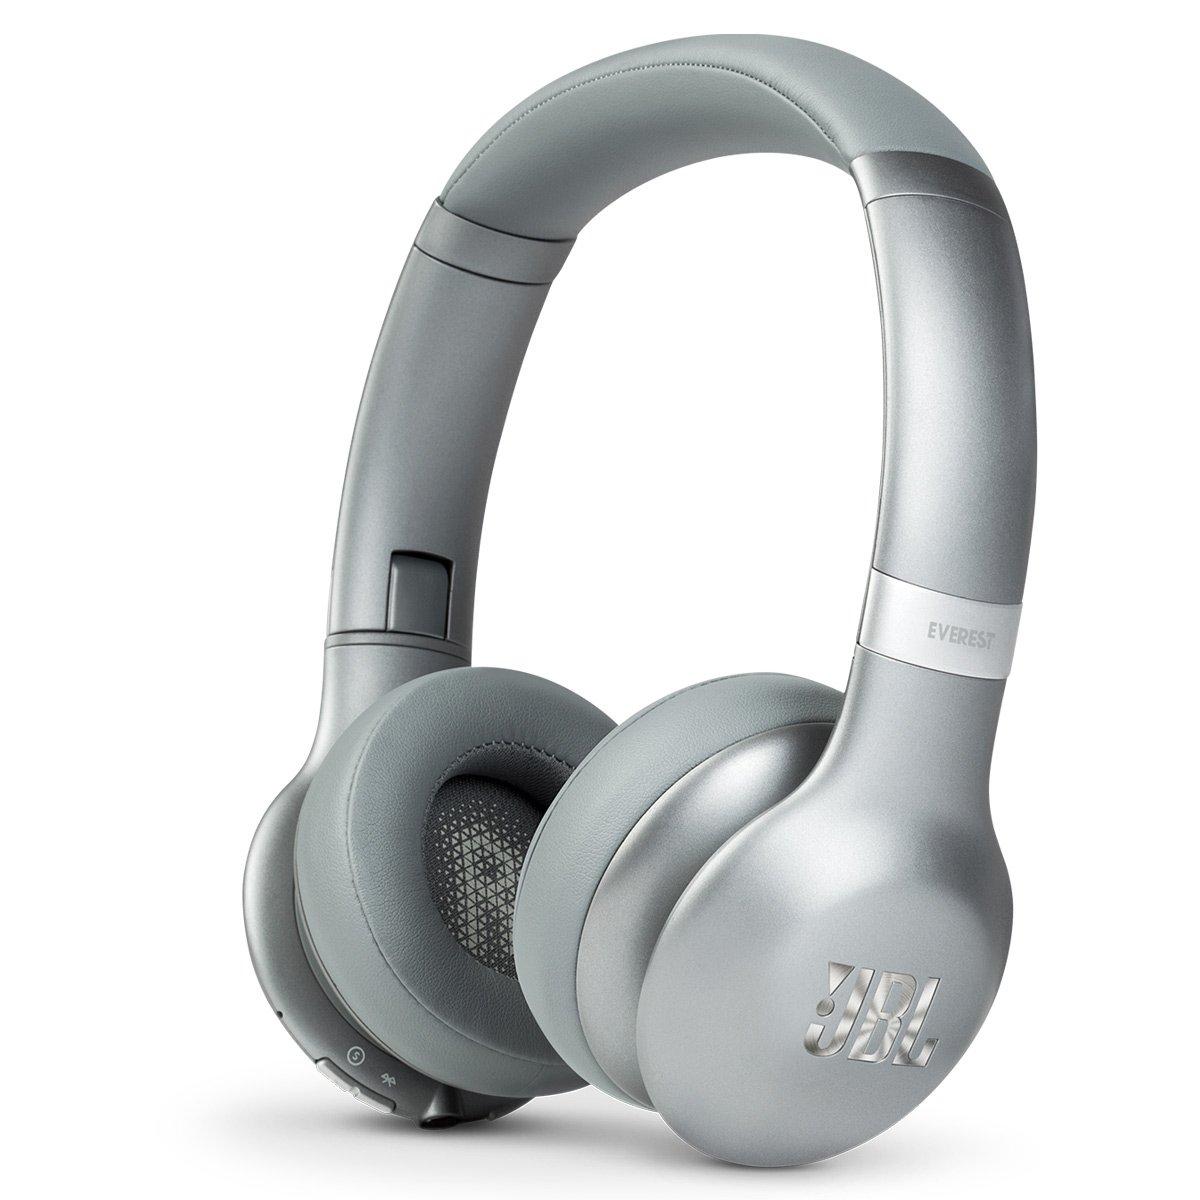 JBL V310BTSIL Everest 310 Wireless On-Ear Headphones (Silver) by JBL